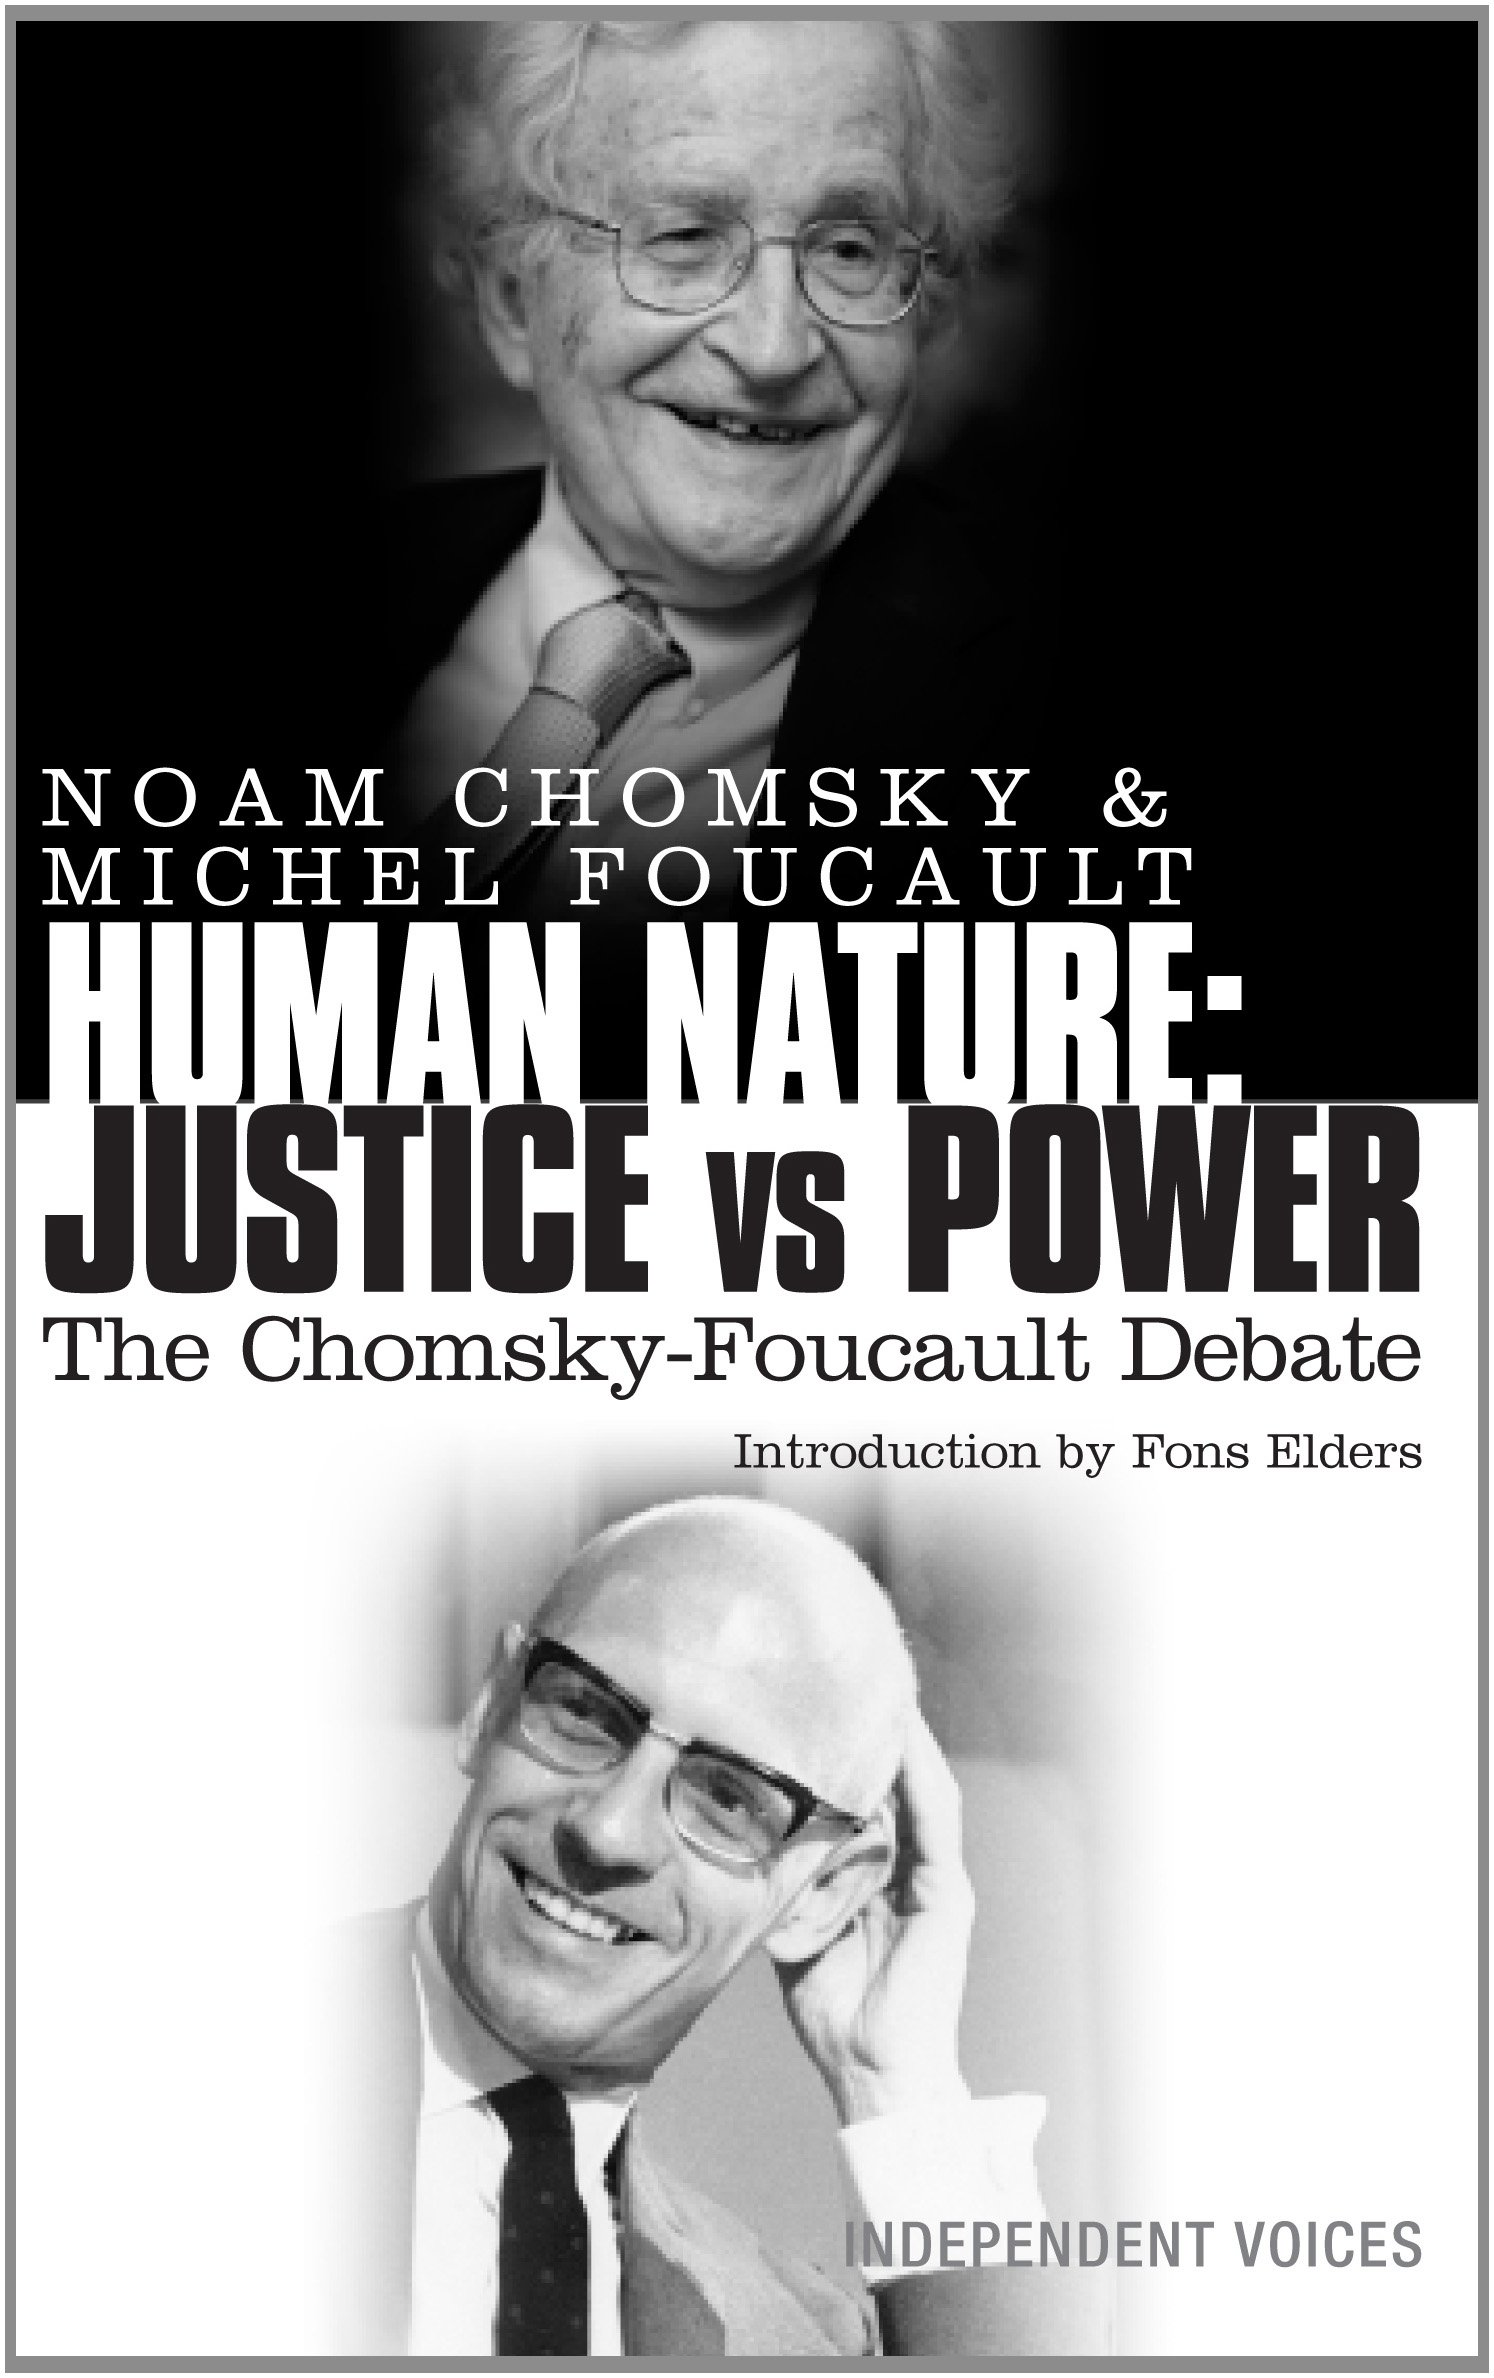 Human Nature: Justice versus Power: The Chomsky-Foucault Debate